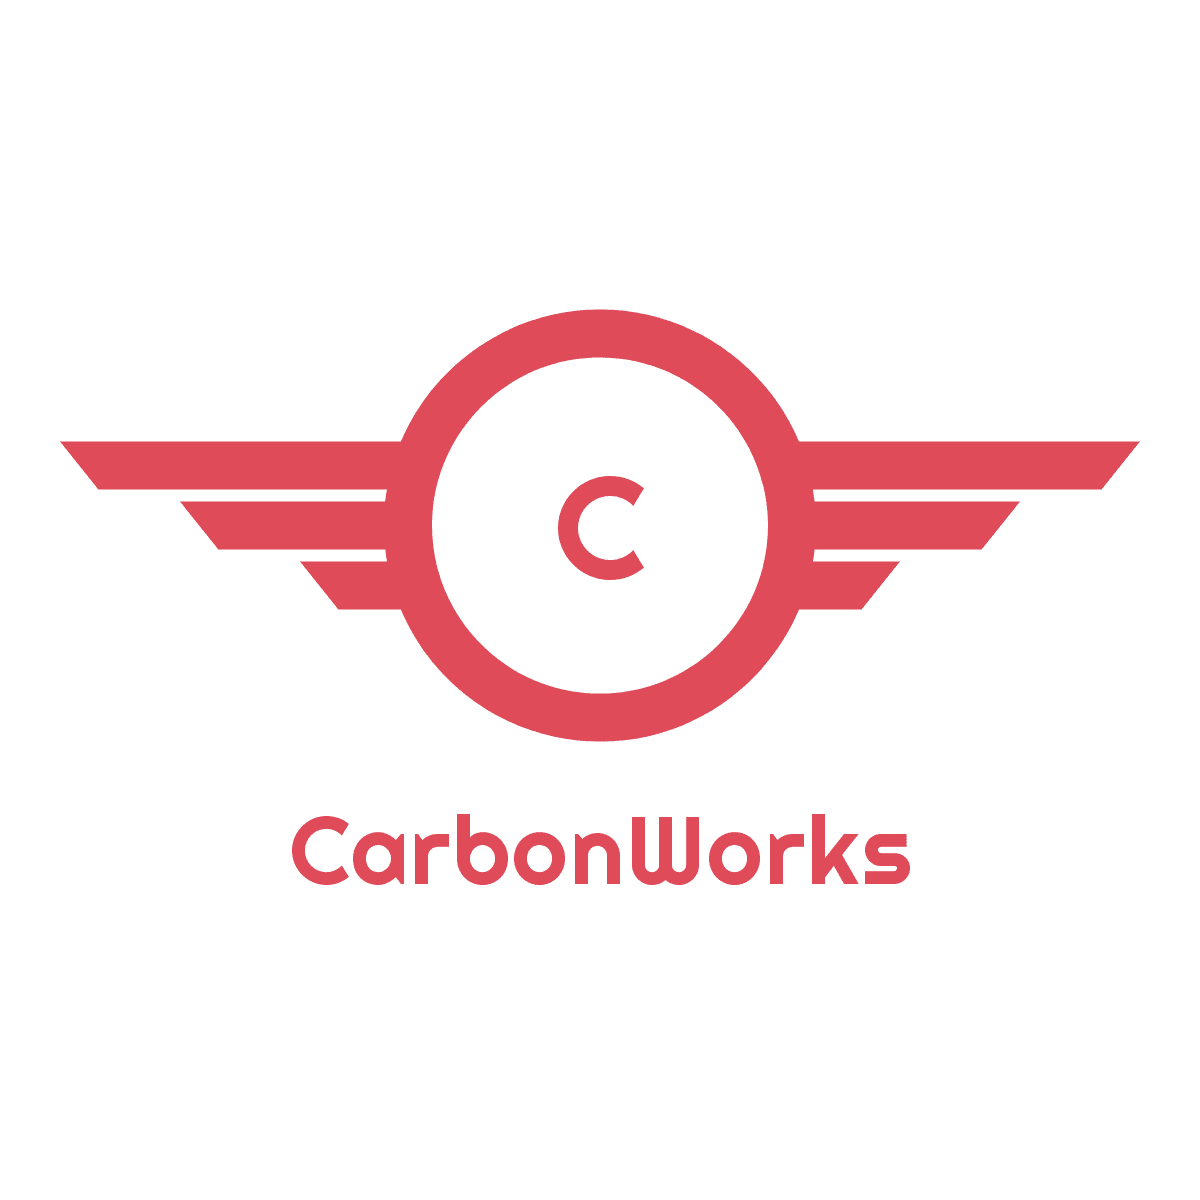 CarbonWorks image